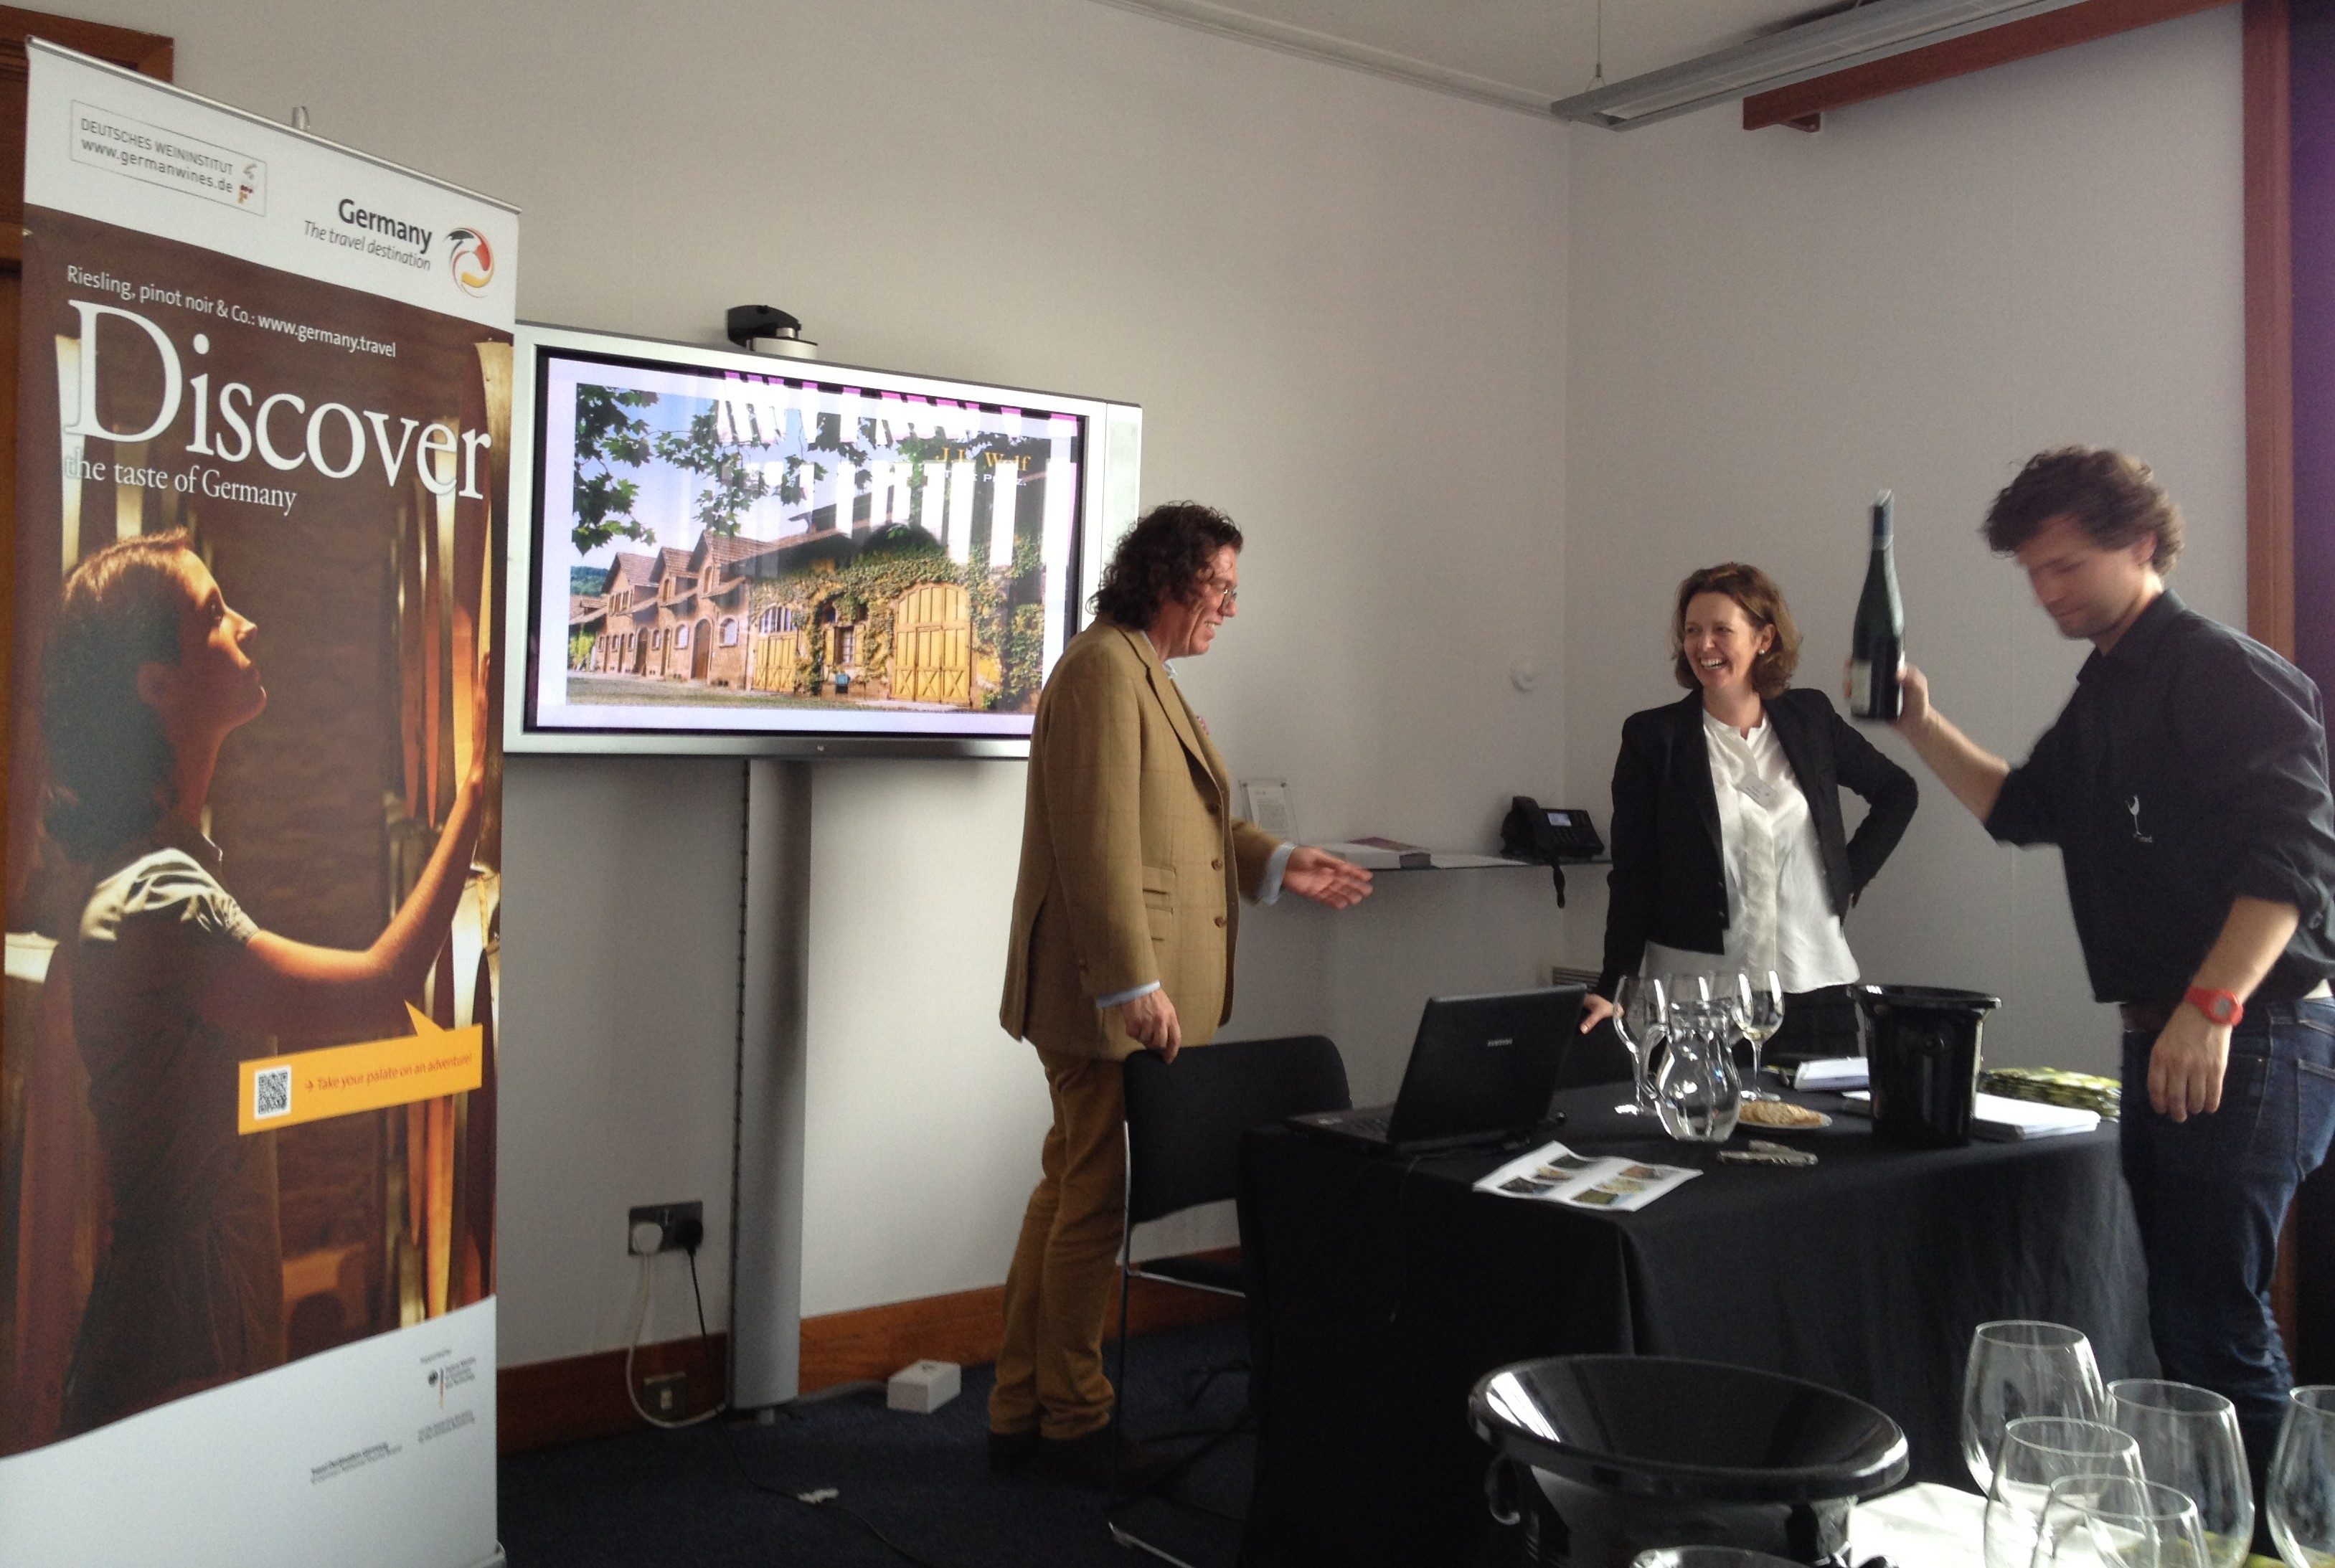 Dr Loosen aka Ernst Loosen giving presentation on German terroir